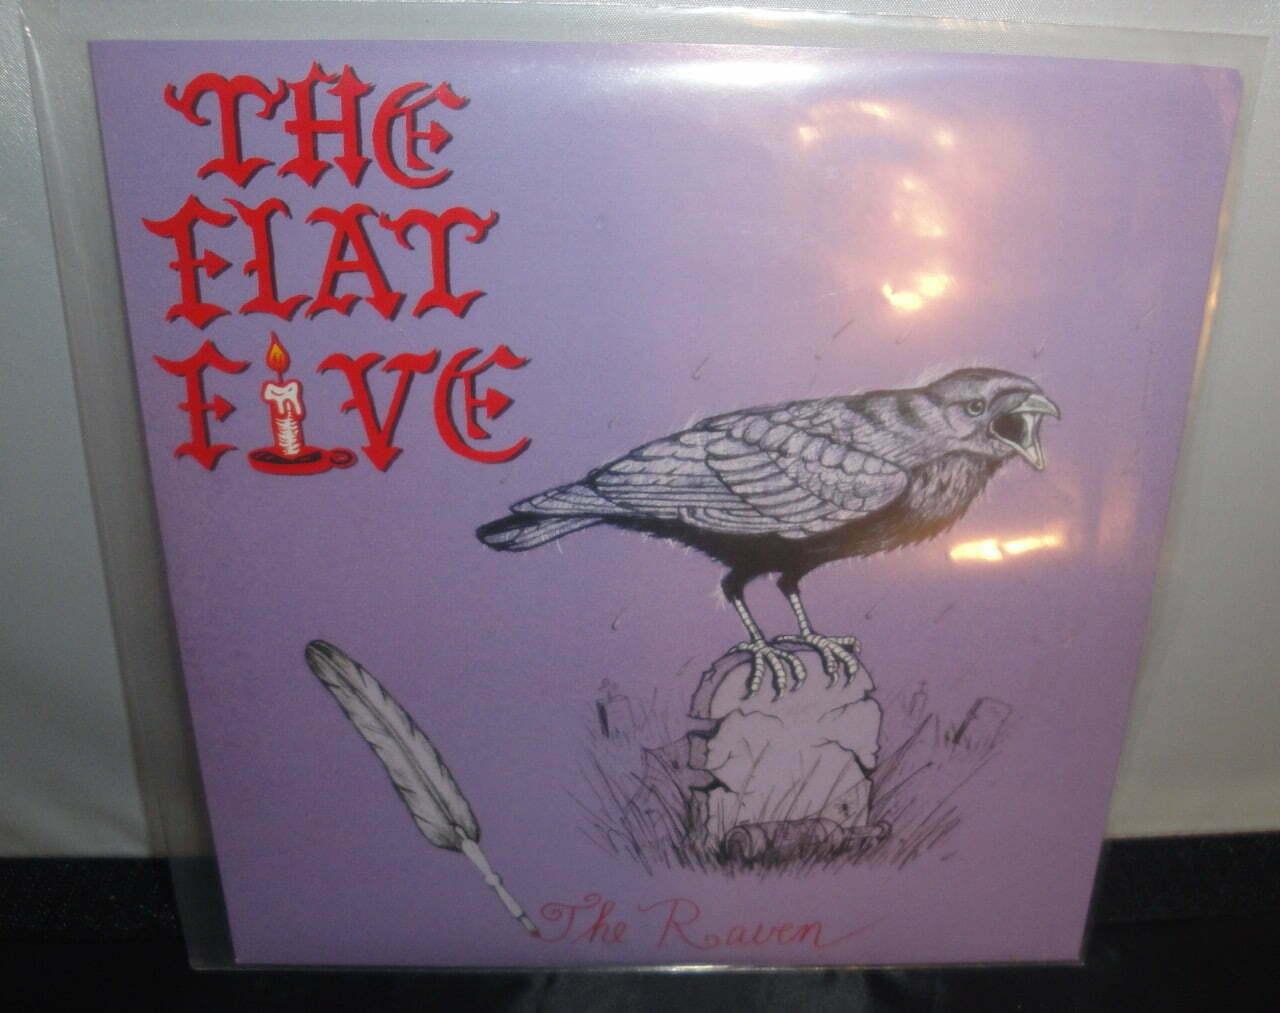 "The Flat Five - The Raven - 7"" Vinyl Single, Limited Edition, Smoky Orange"